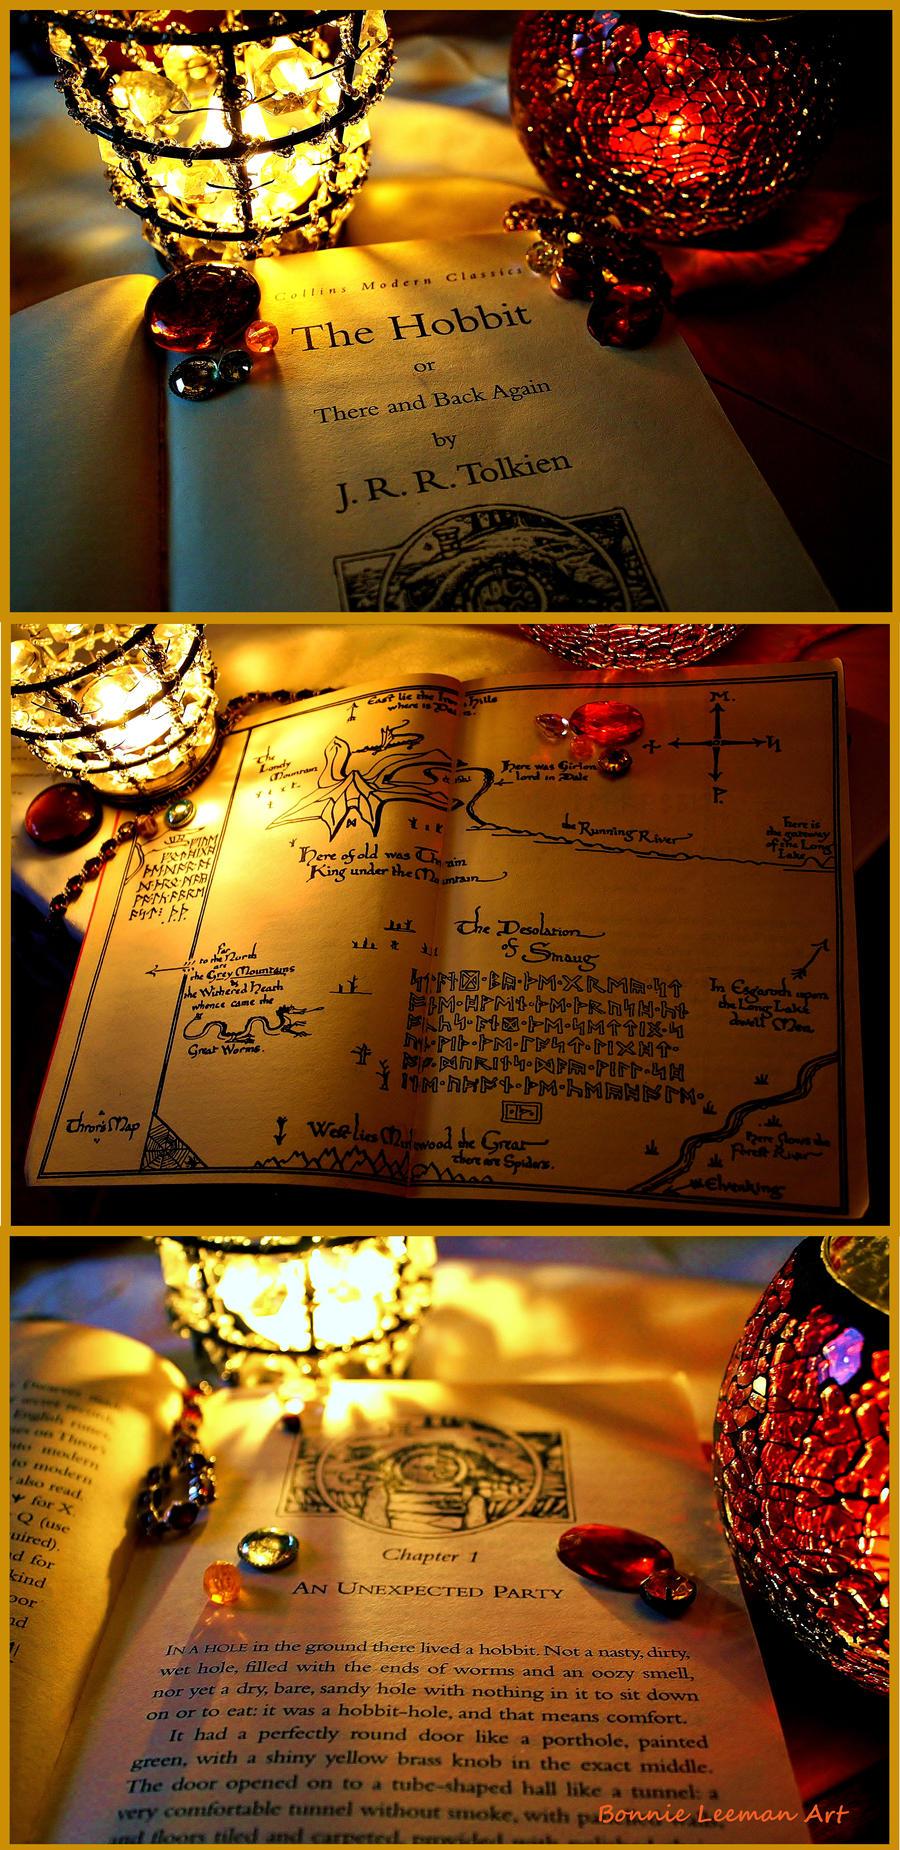 J. R. R. Tolkien's The Hobbit by Bonniemarie